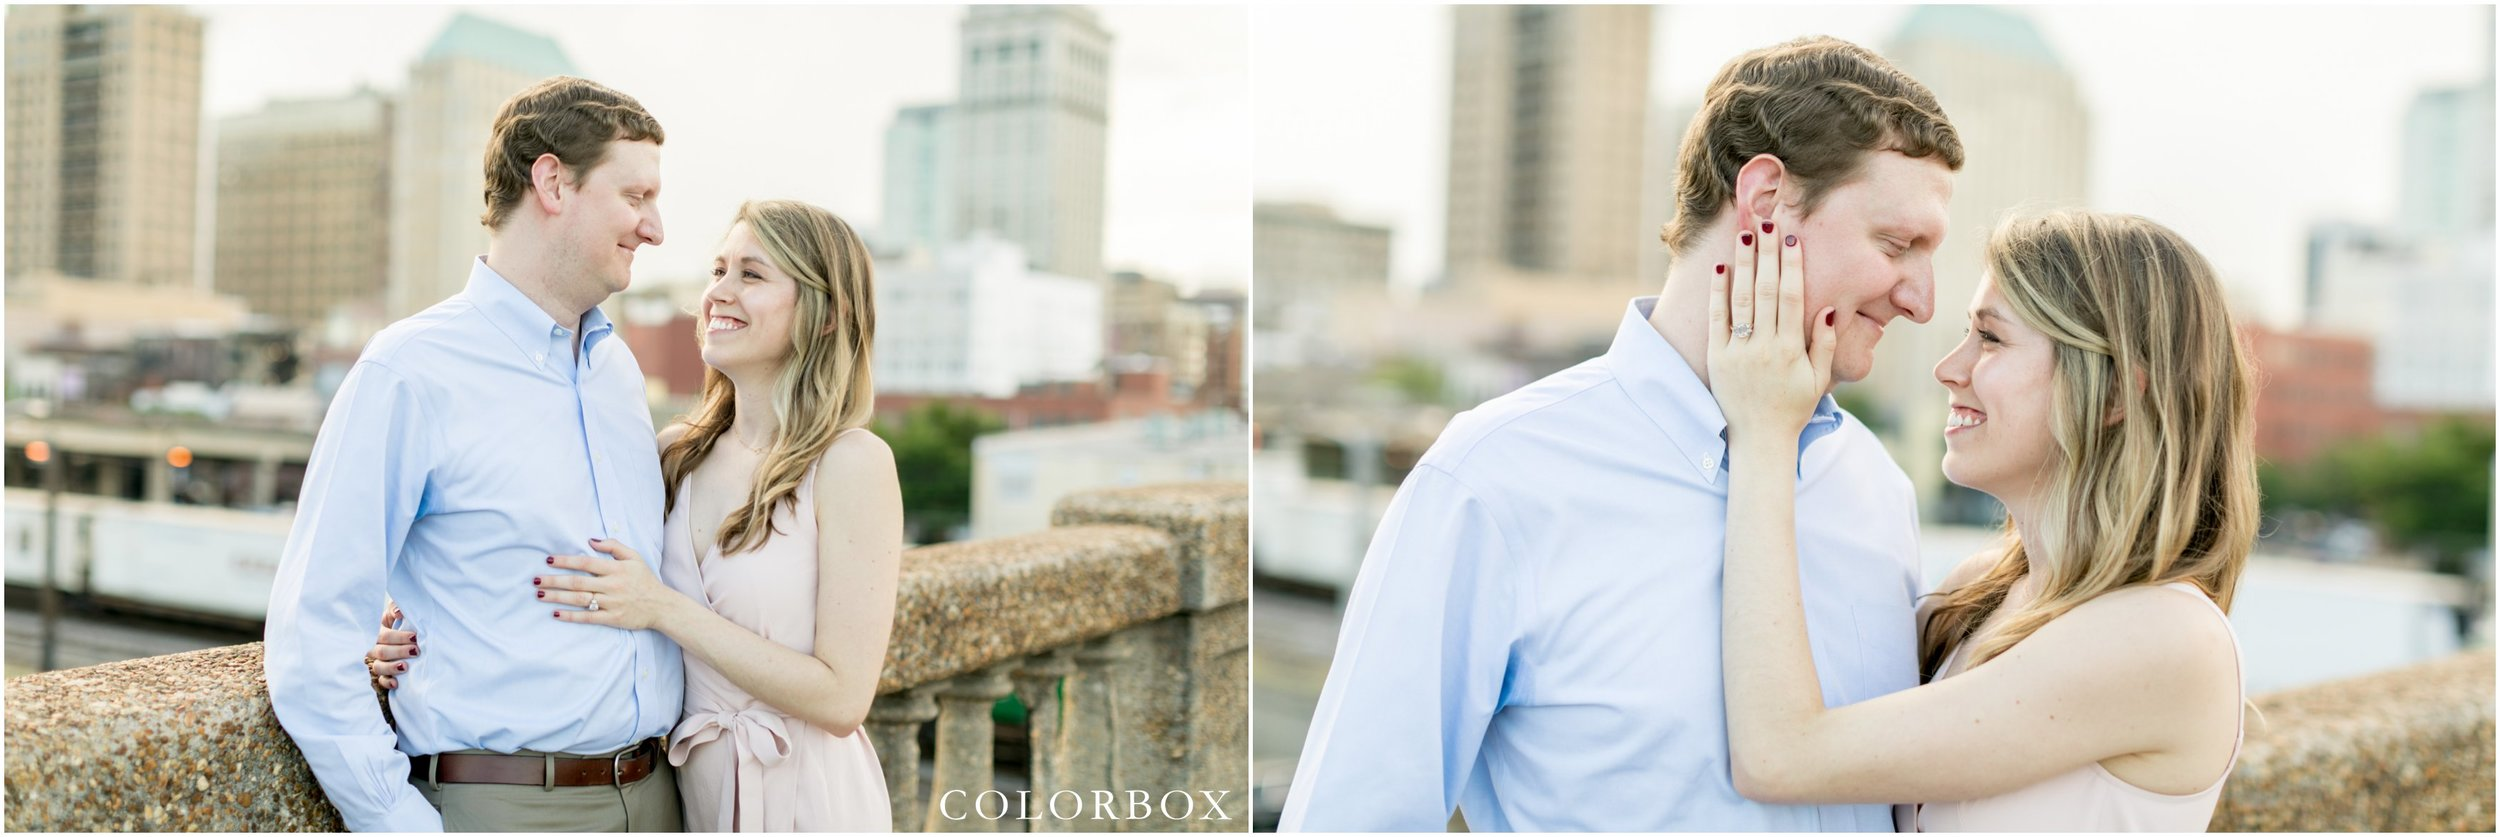 colorboxphotographers_6359.jpg